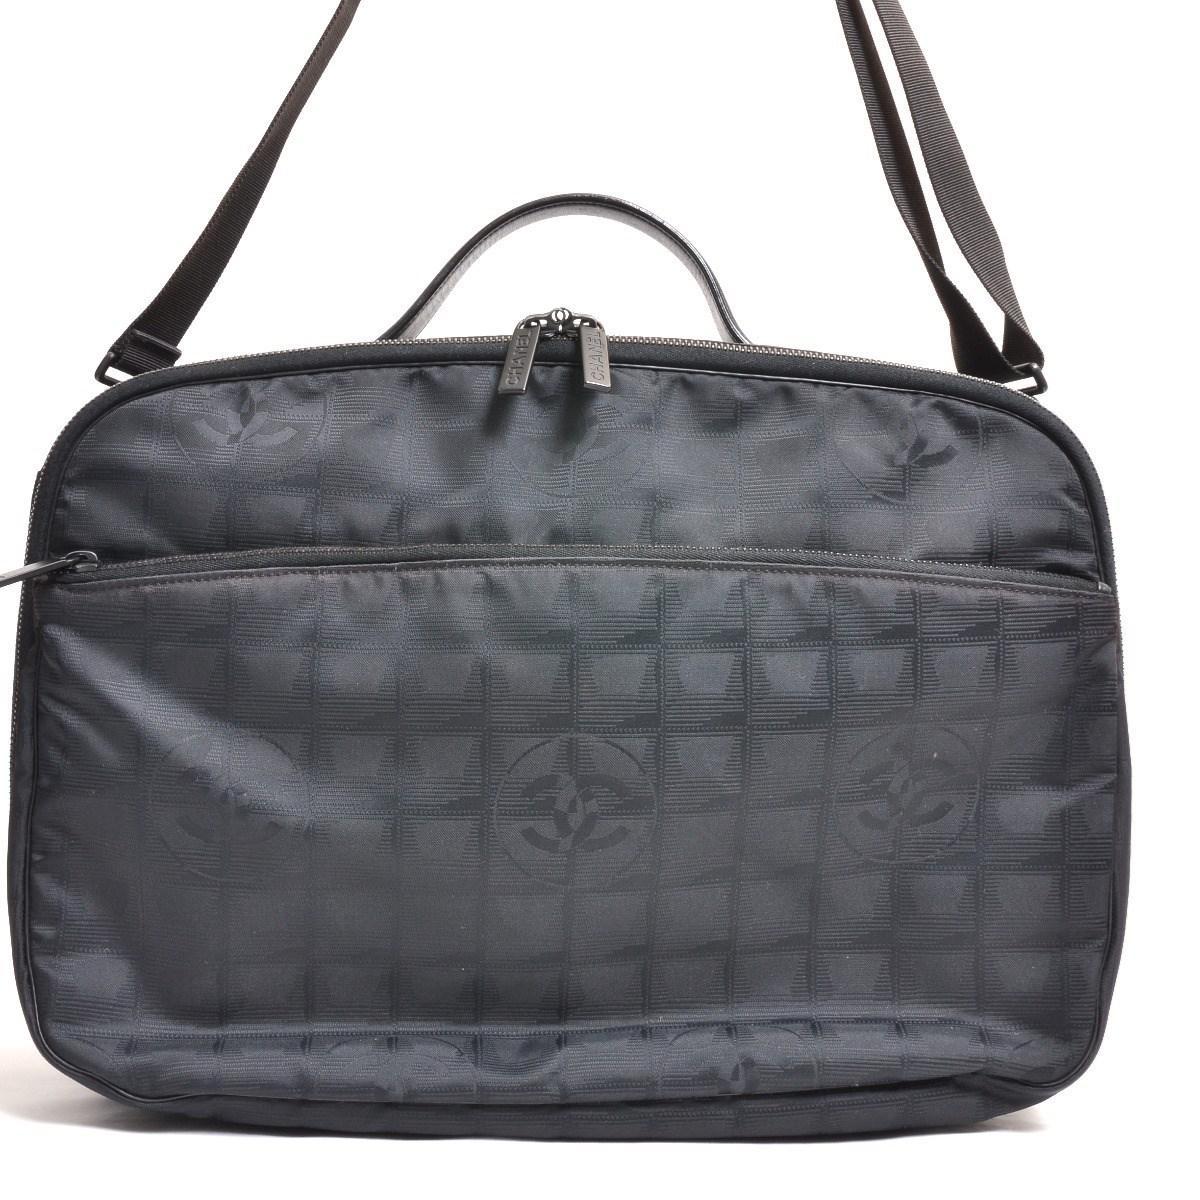 960b81efd18d Lyst - Chanel Nylon Jacquard 2 Way Travel Bag New Travel Line ...